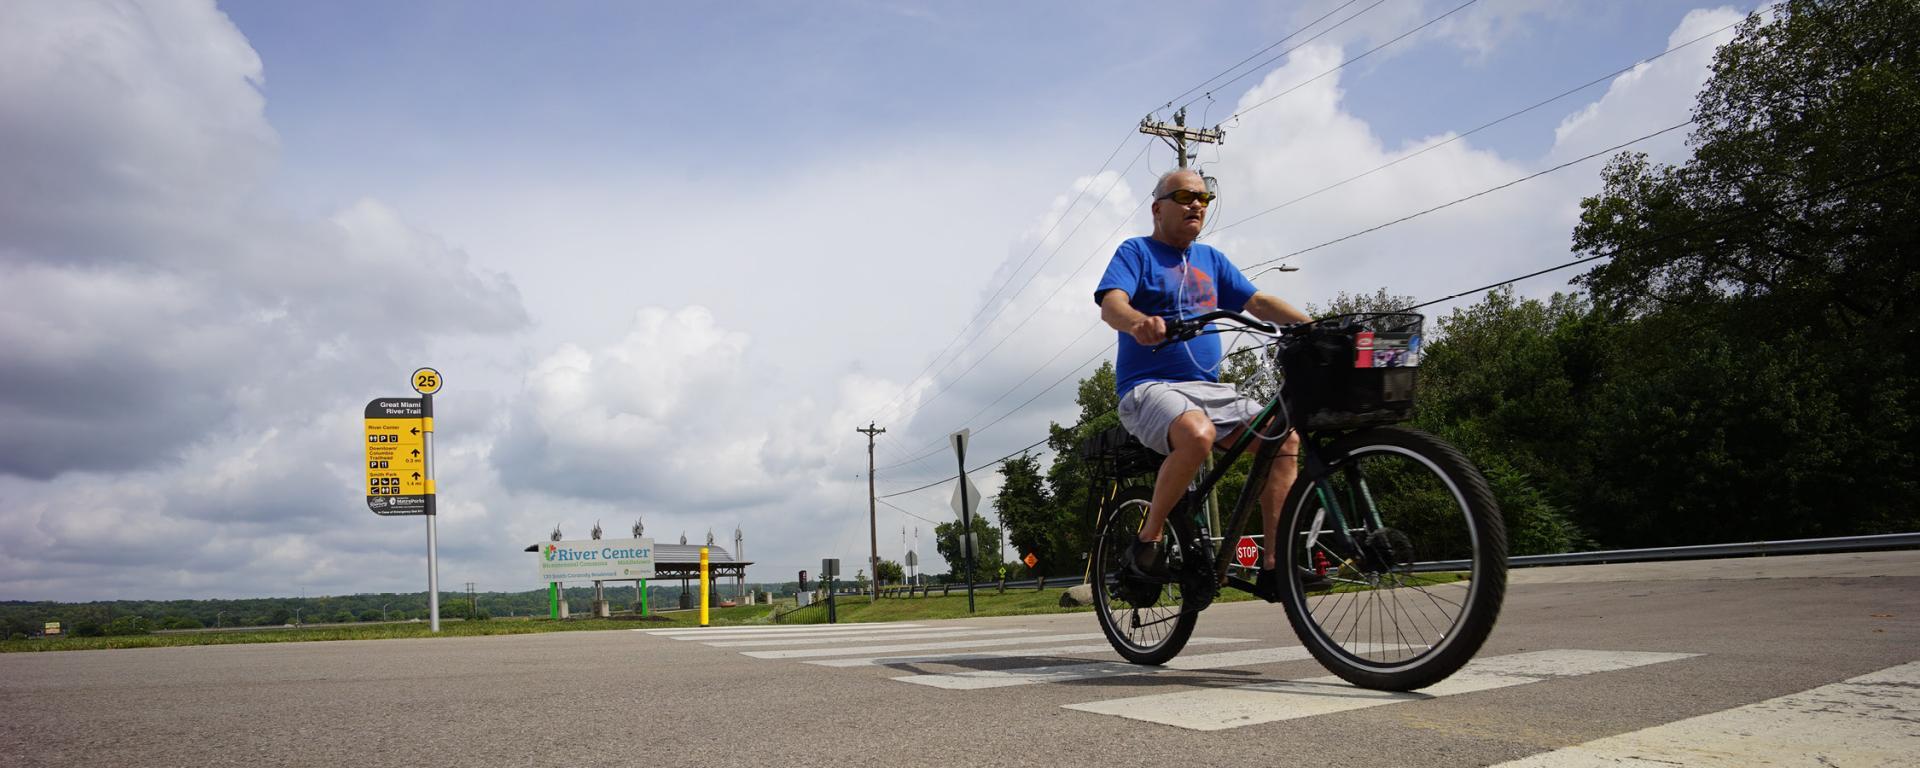 man riding bike across a street